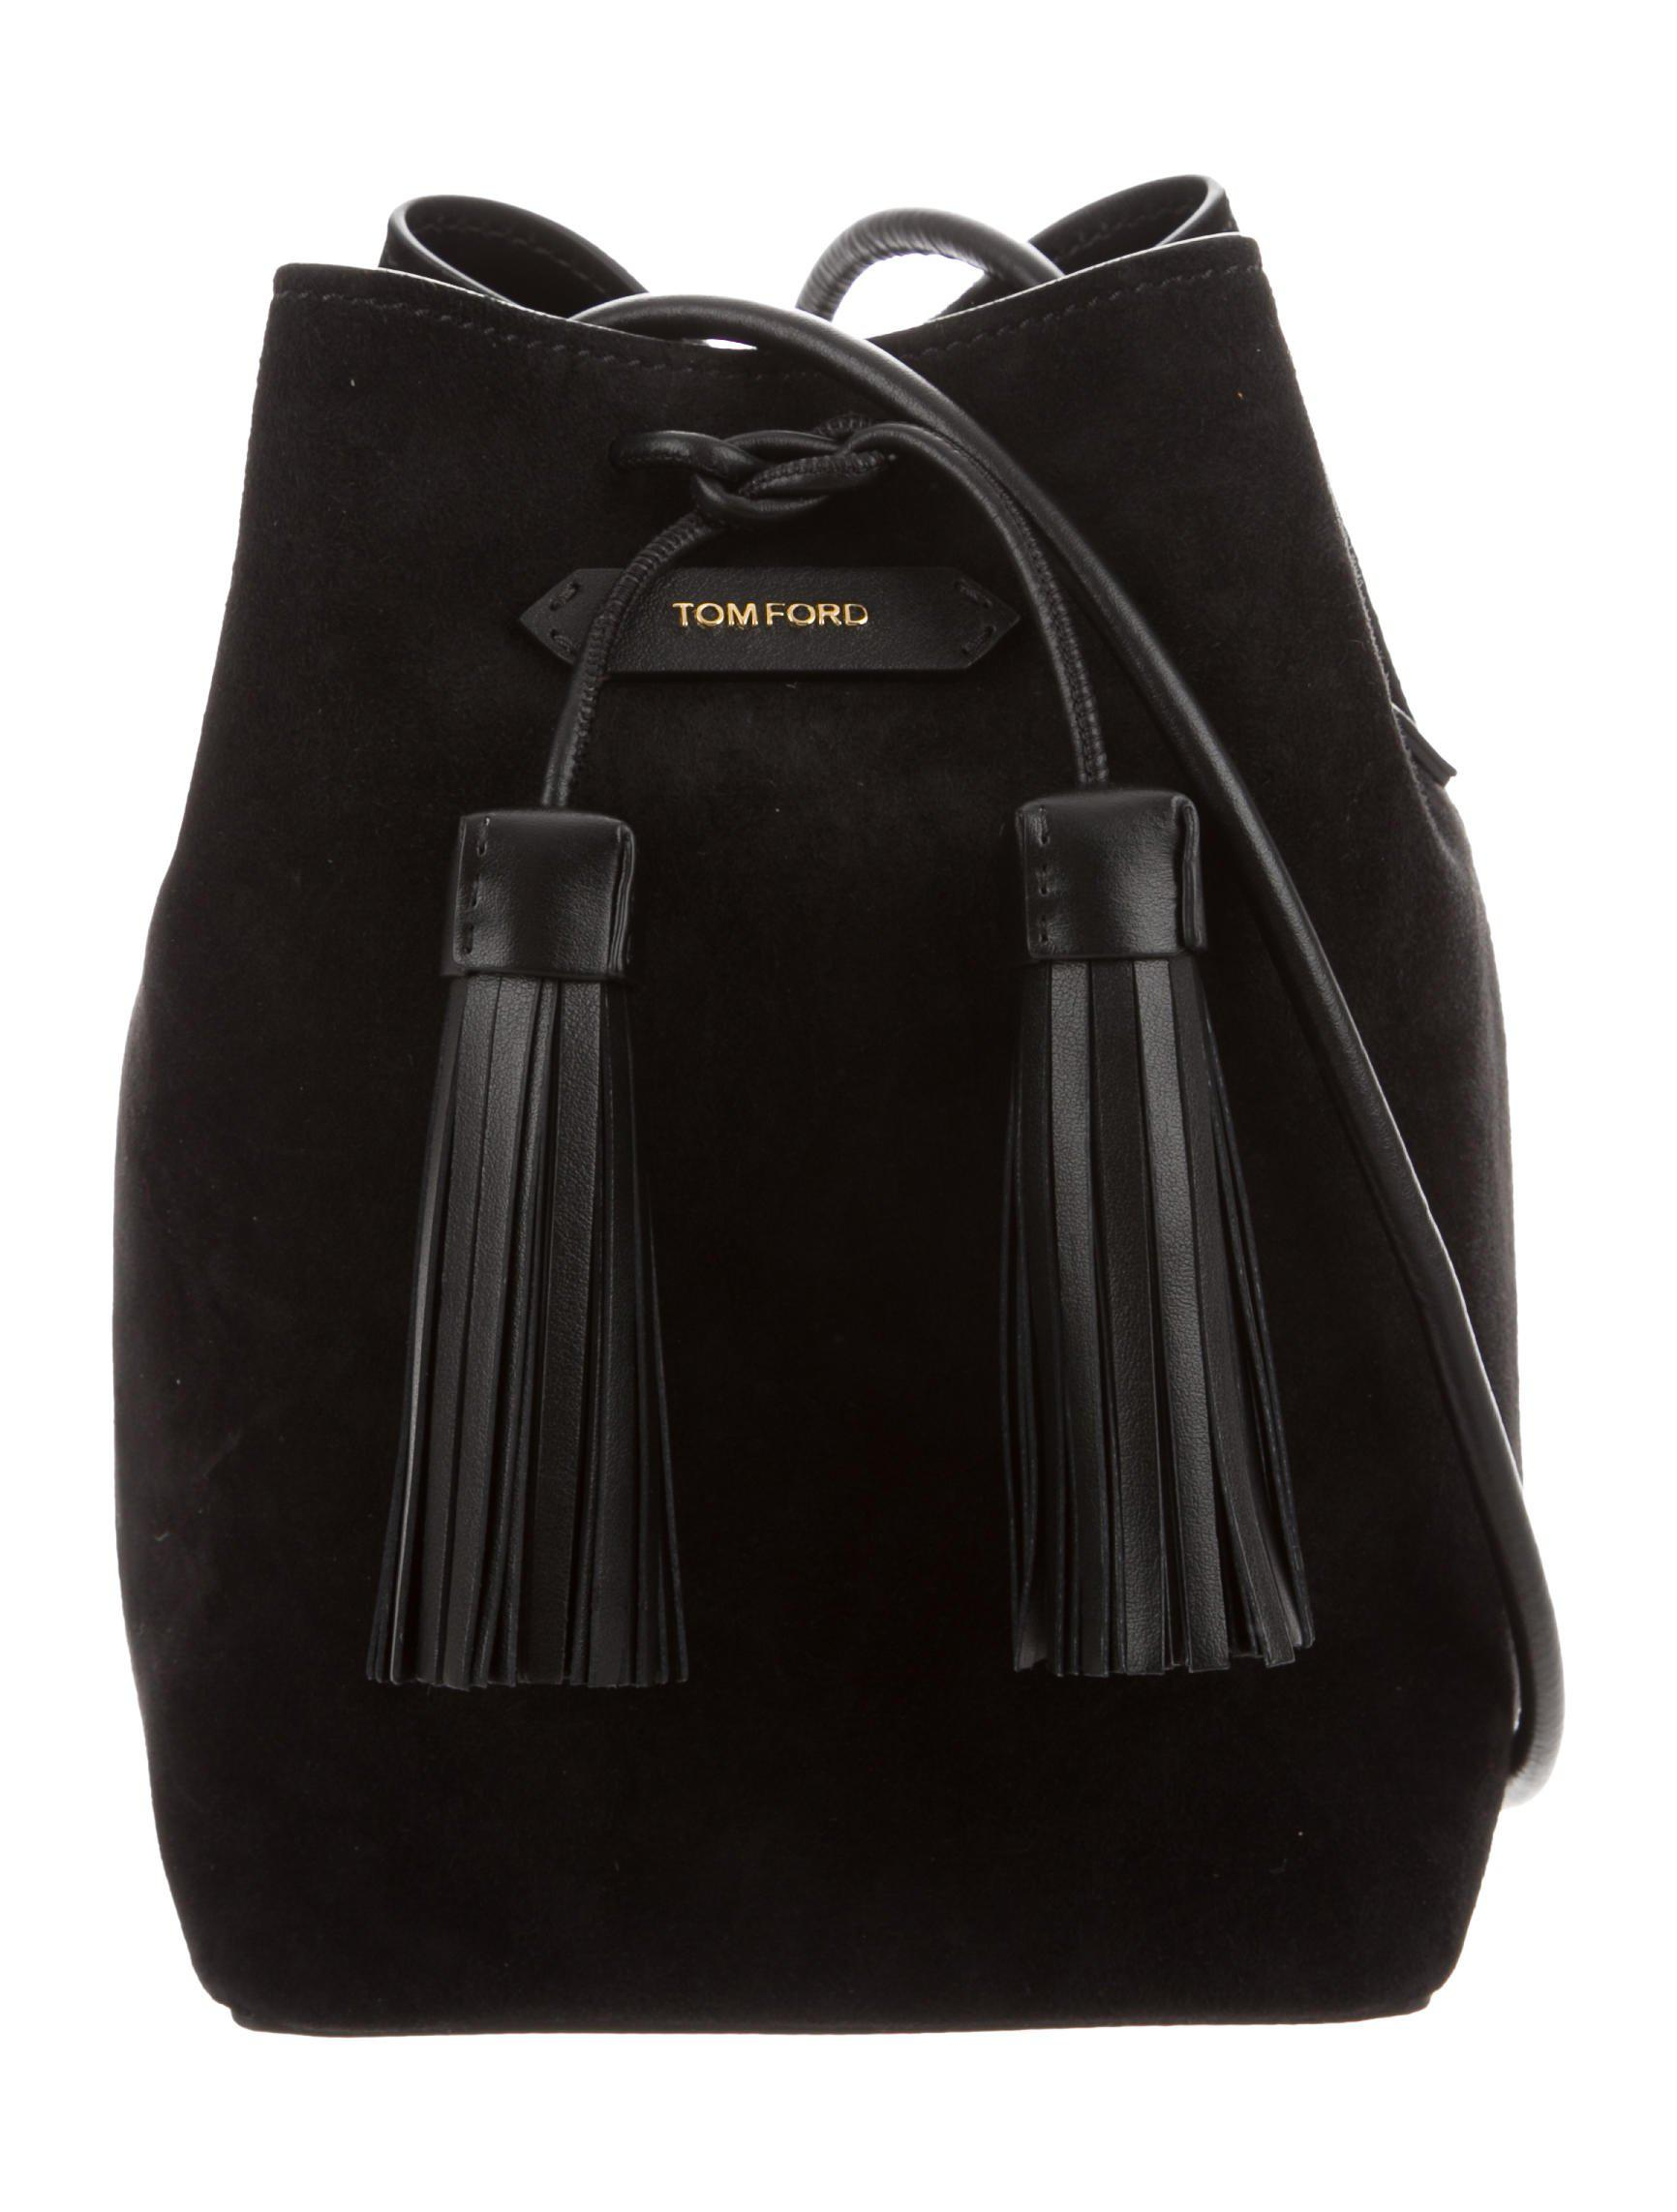 Tom Ford - Metallic Suede Double Tassel Bucket Bag Black - Lyst. View  fullscreen 2f6b66058c98